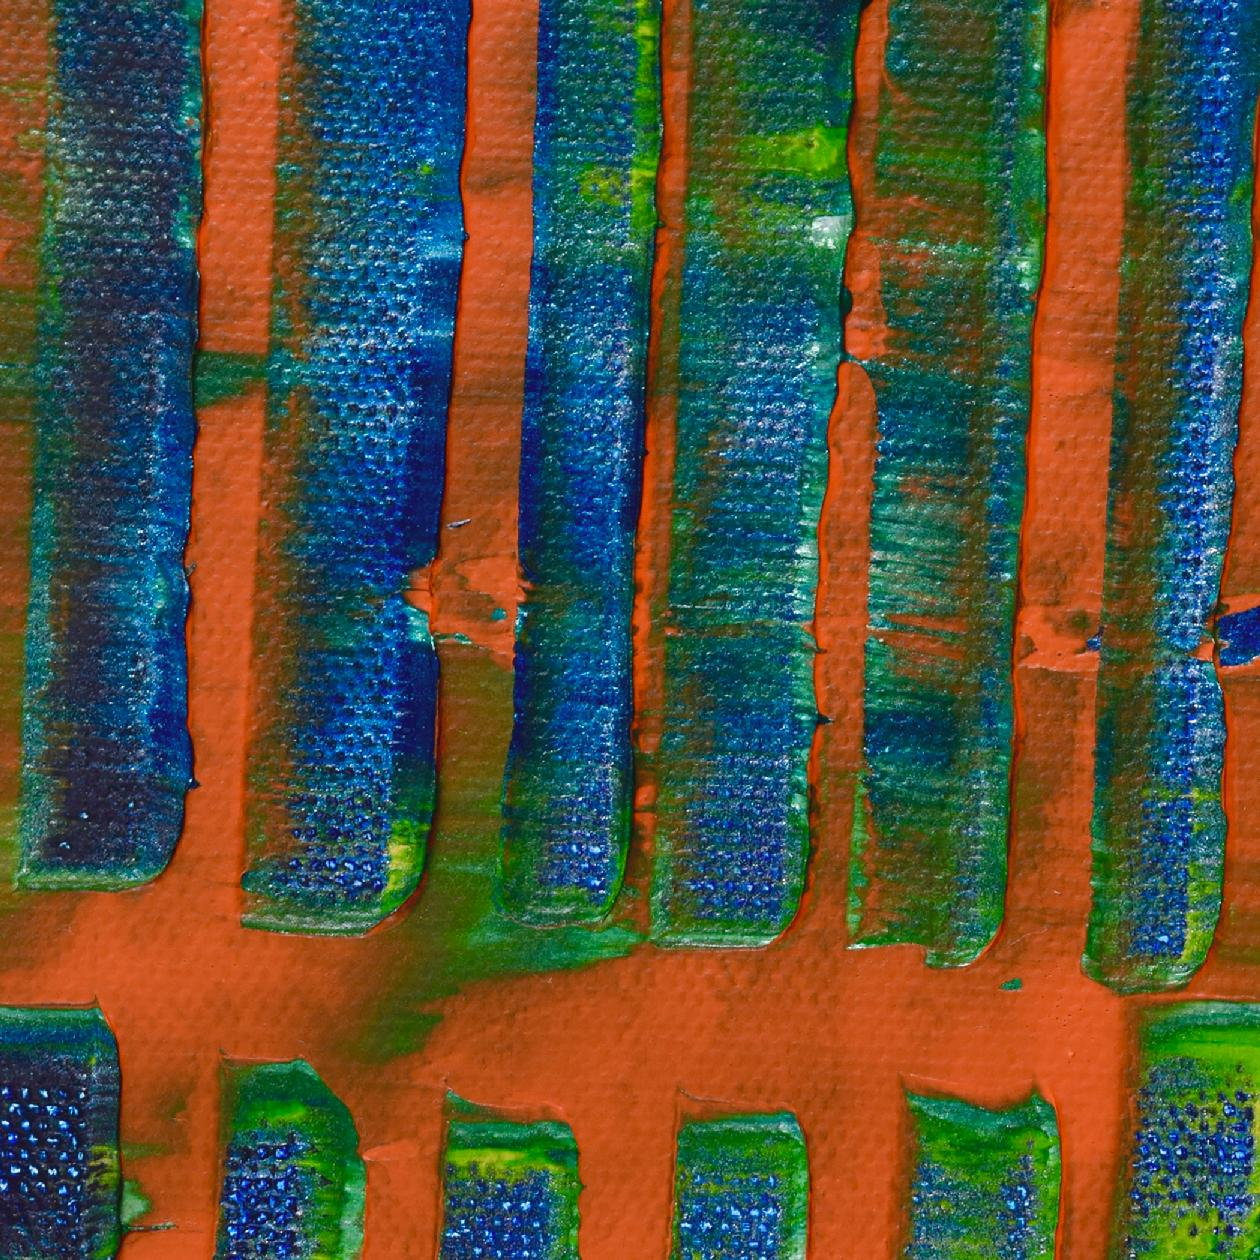 Detail - Orange Panorama (Blue Reflections) (2020) by Nestor Toro